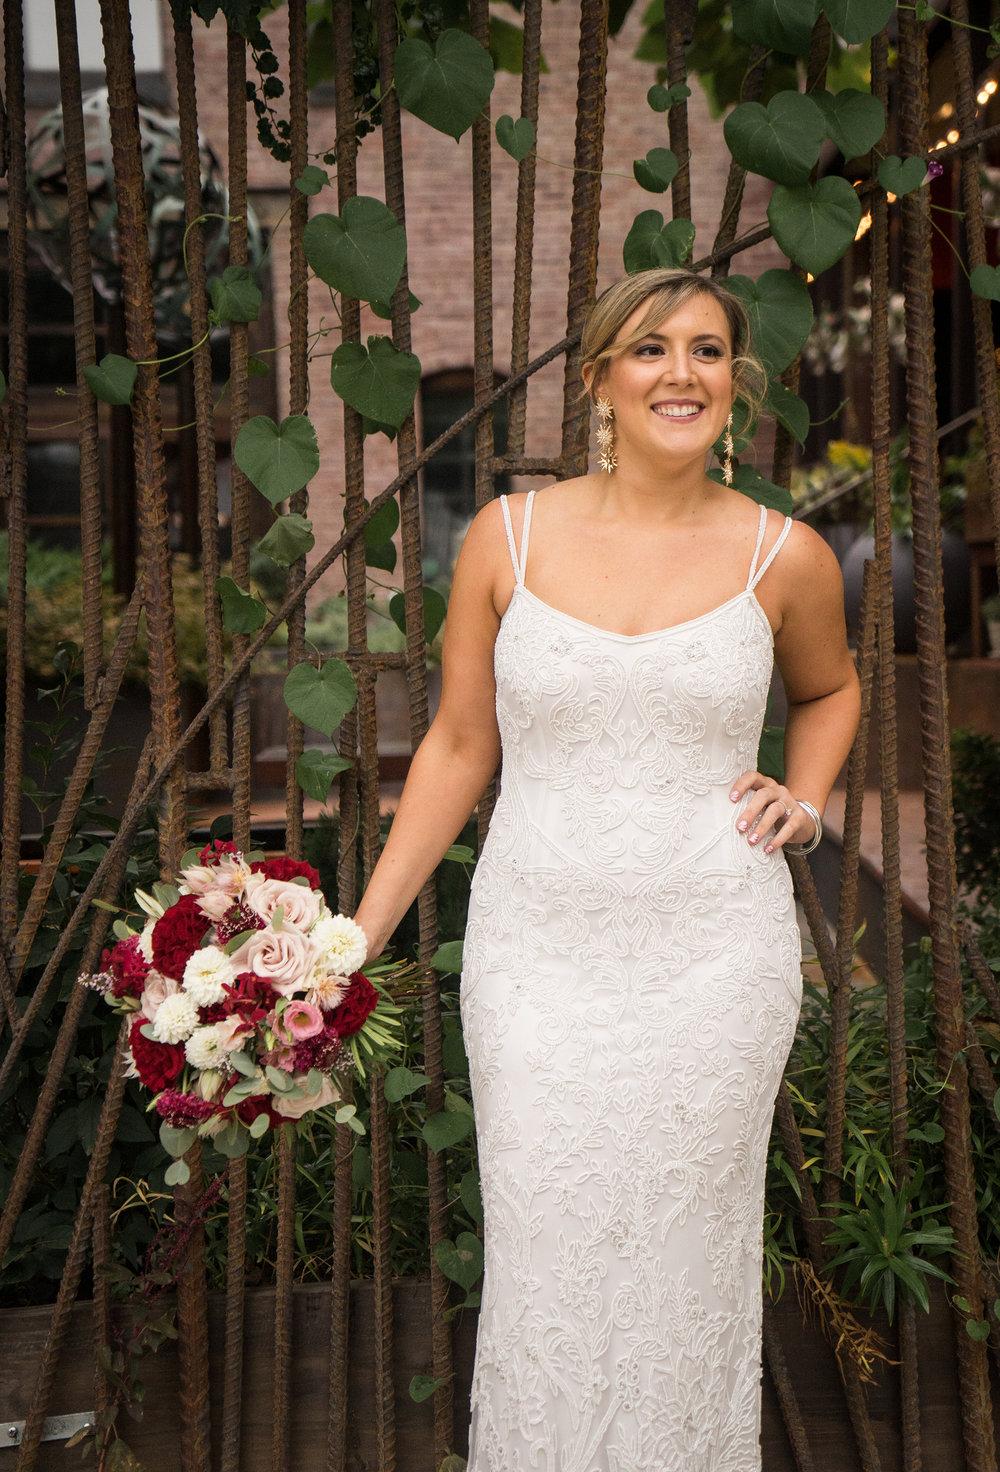 Julep-Belle-Wedding-Photography-Los-Angeles-Grace-Jake-01.jpg